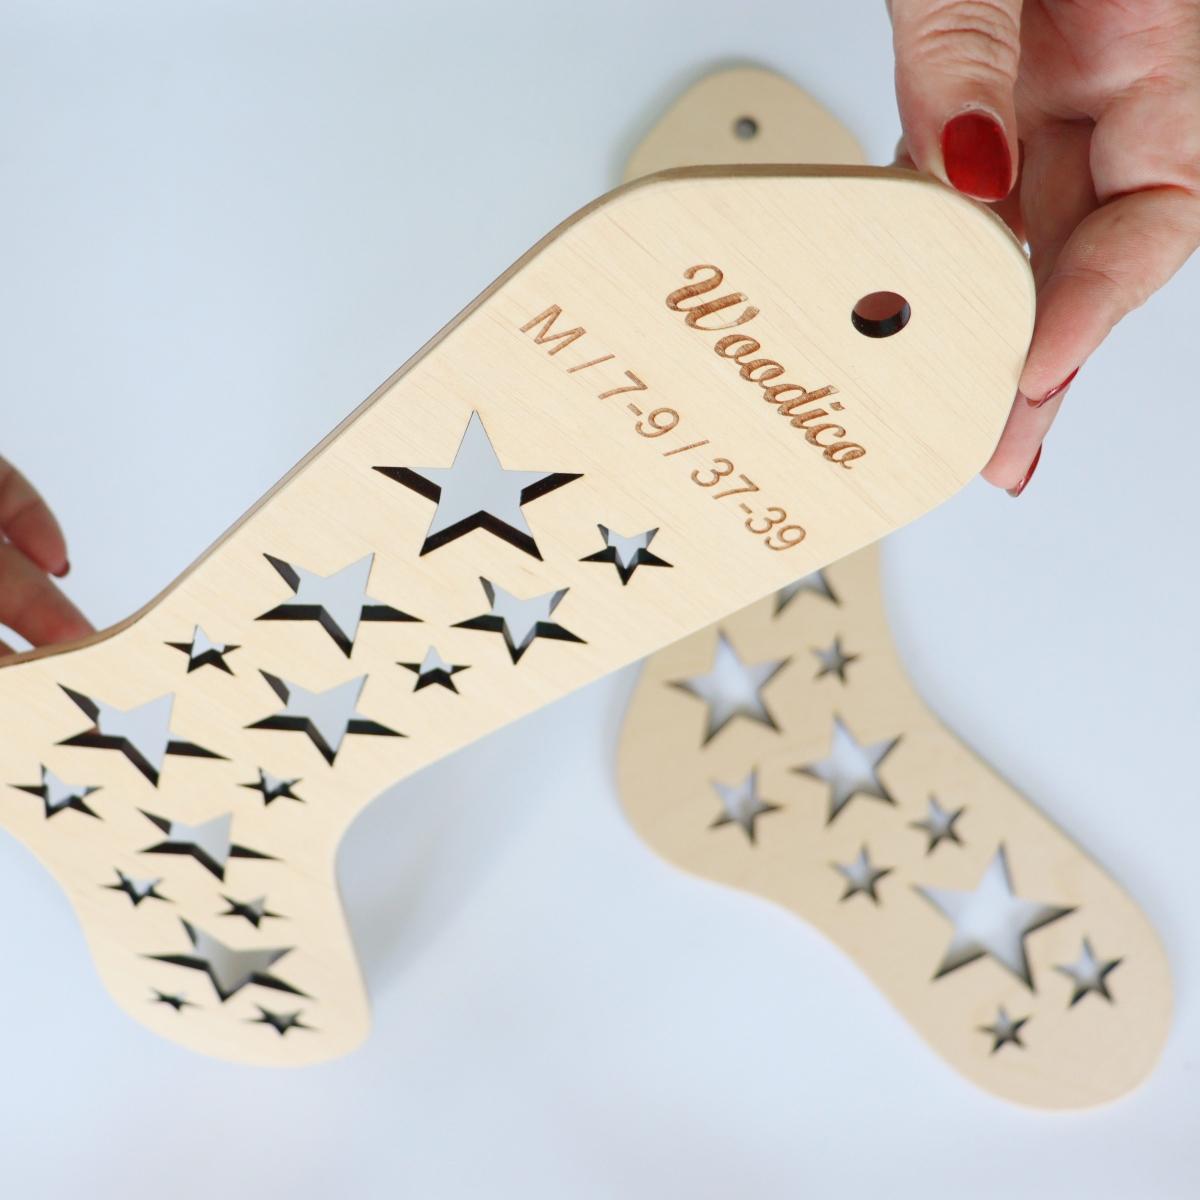 woodico.pro wooden sock blockers stars 5 1200x1200 - Wooden sock blockers / Stars